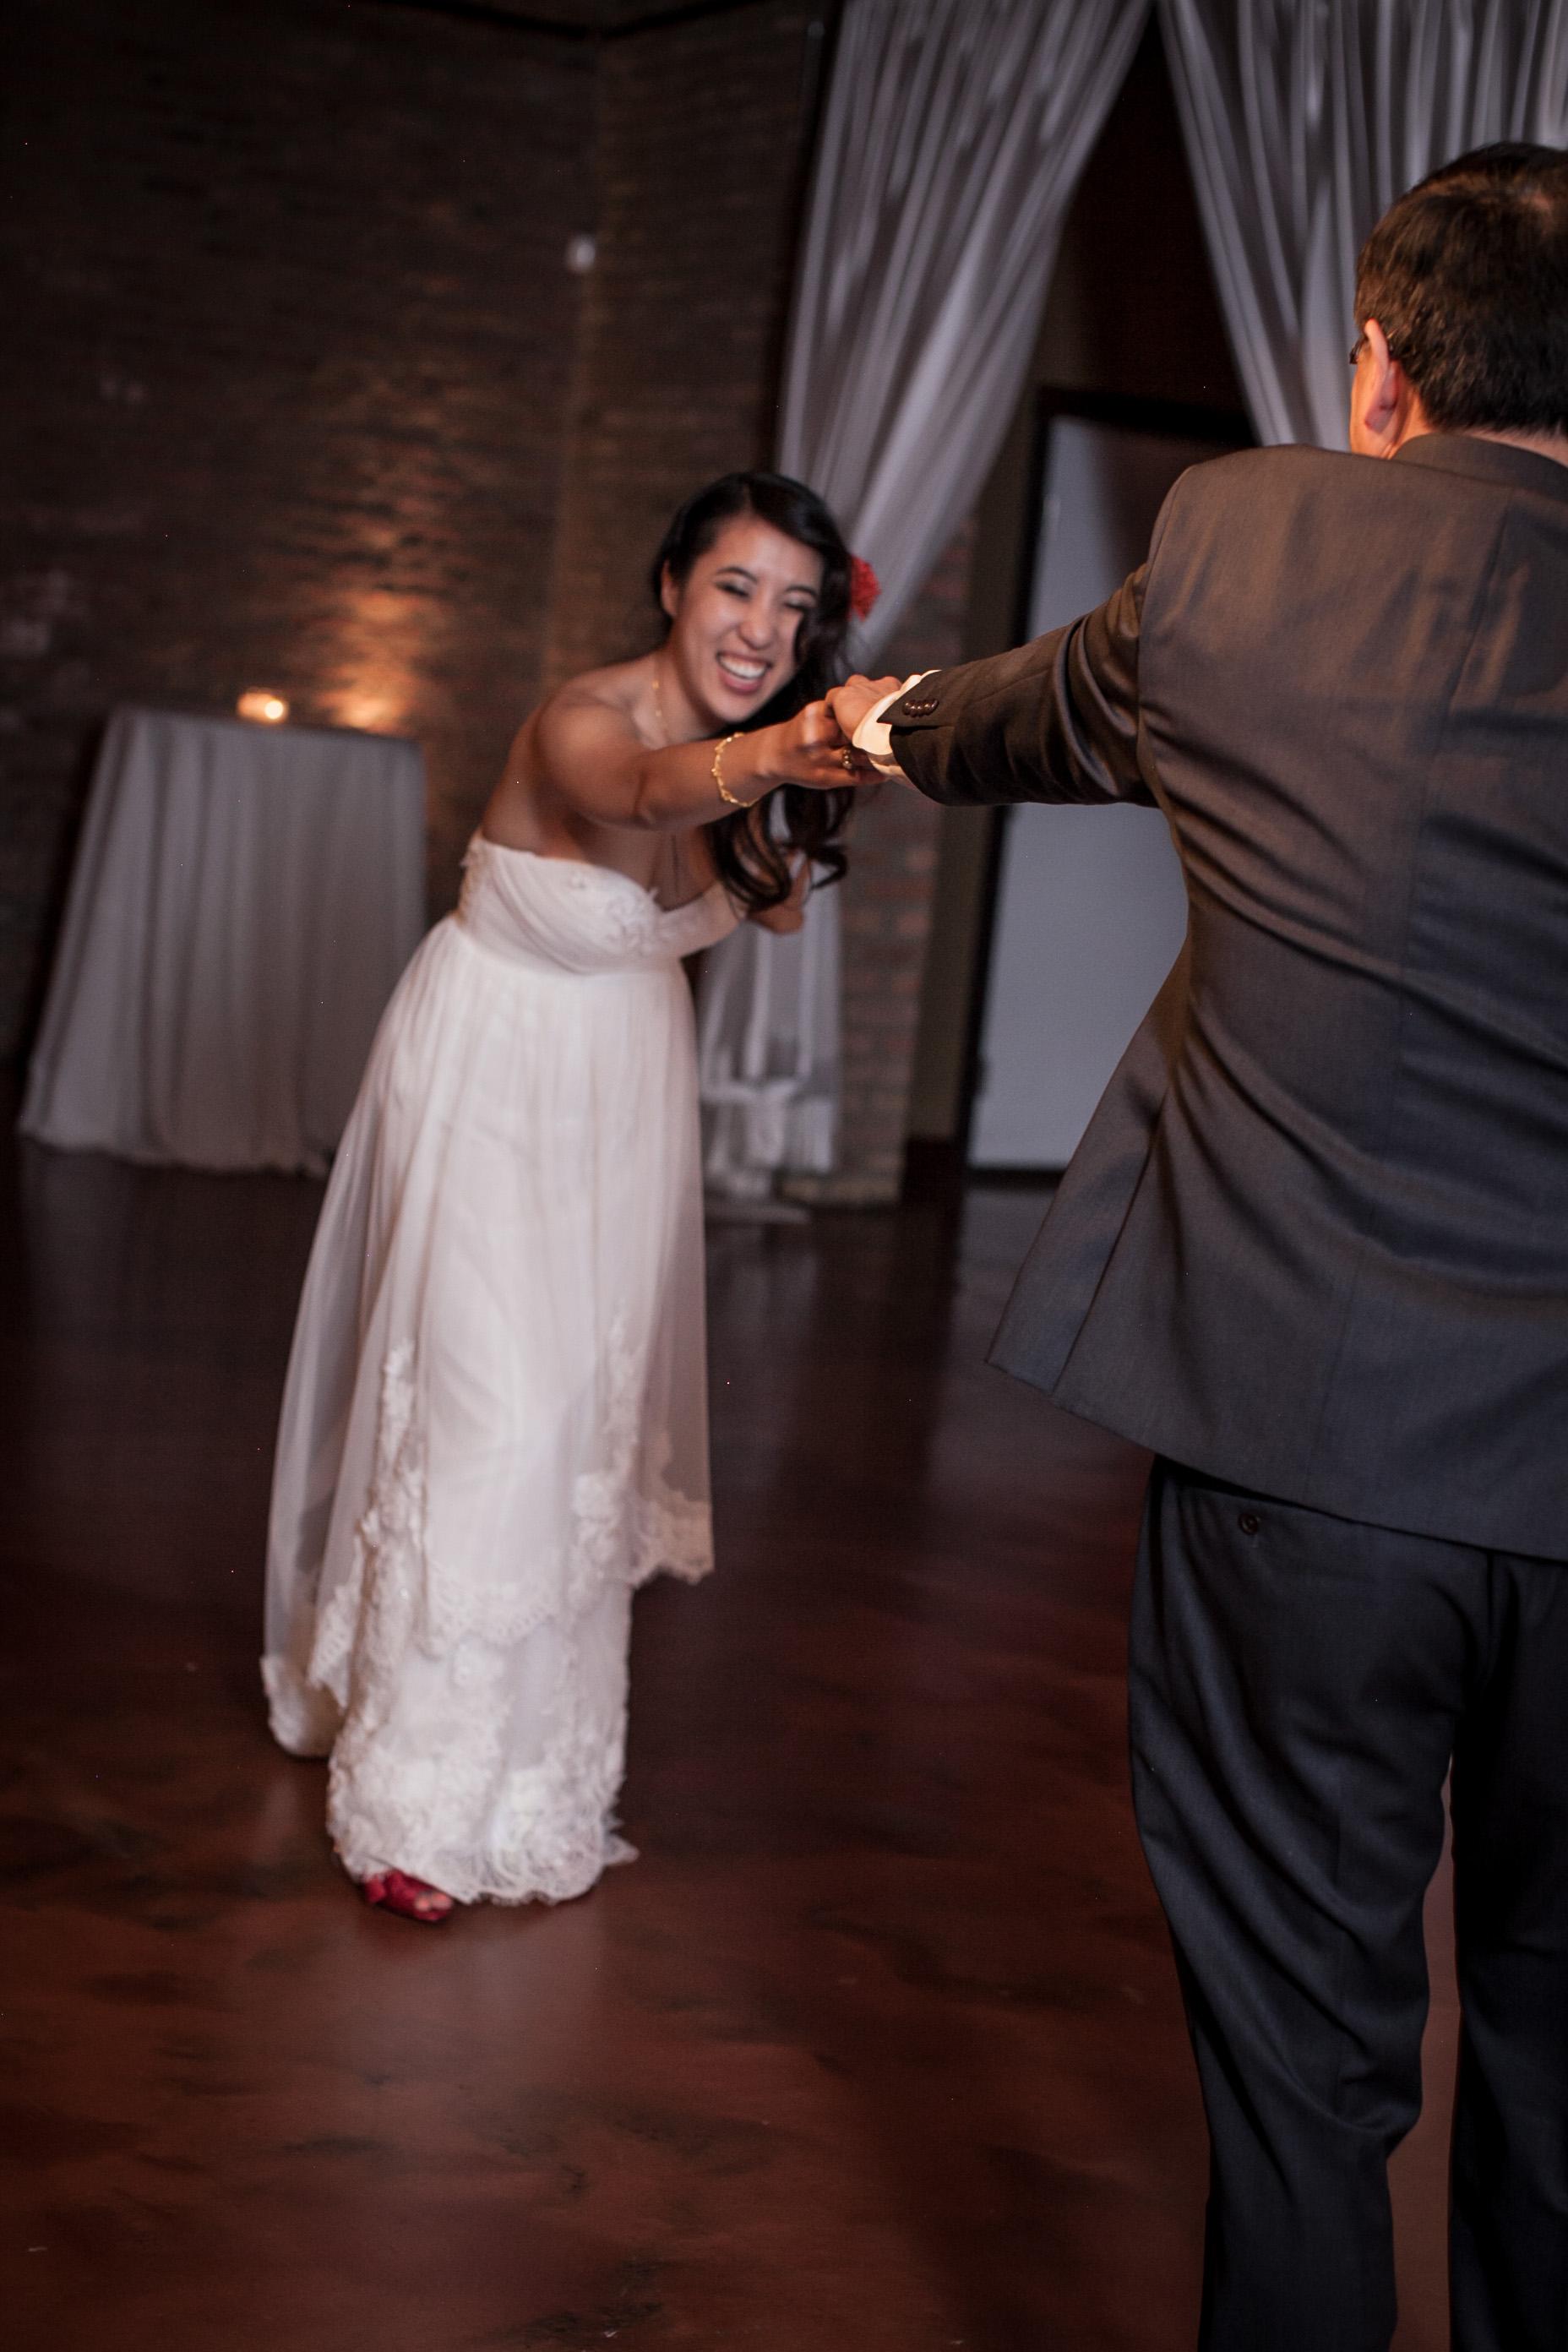 mayon & martin university of chicago loft on lake wedding summer -013.jpg